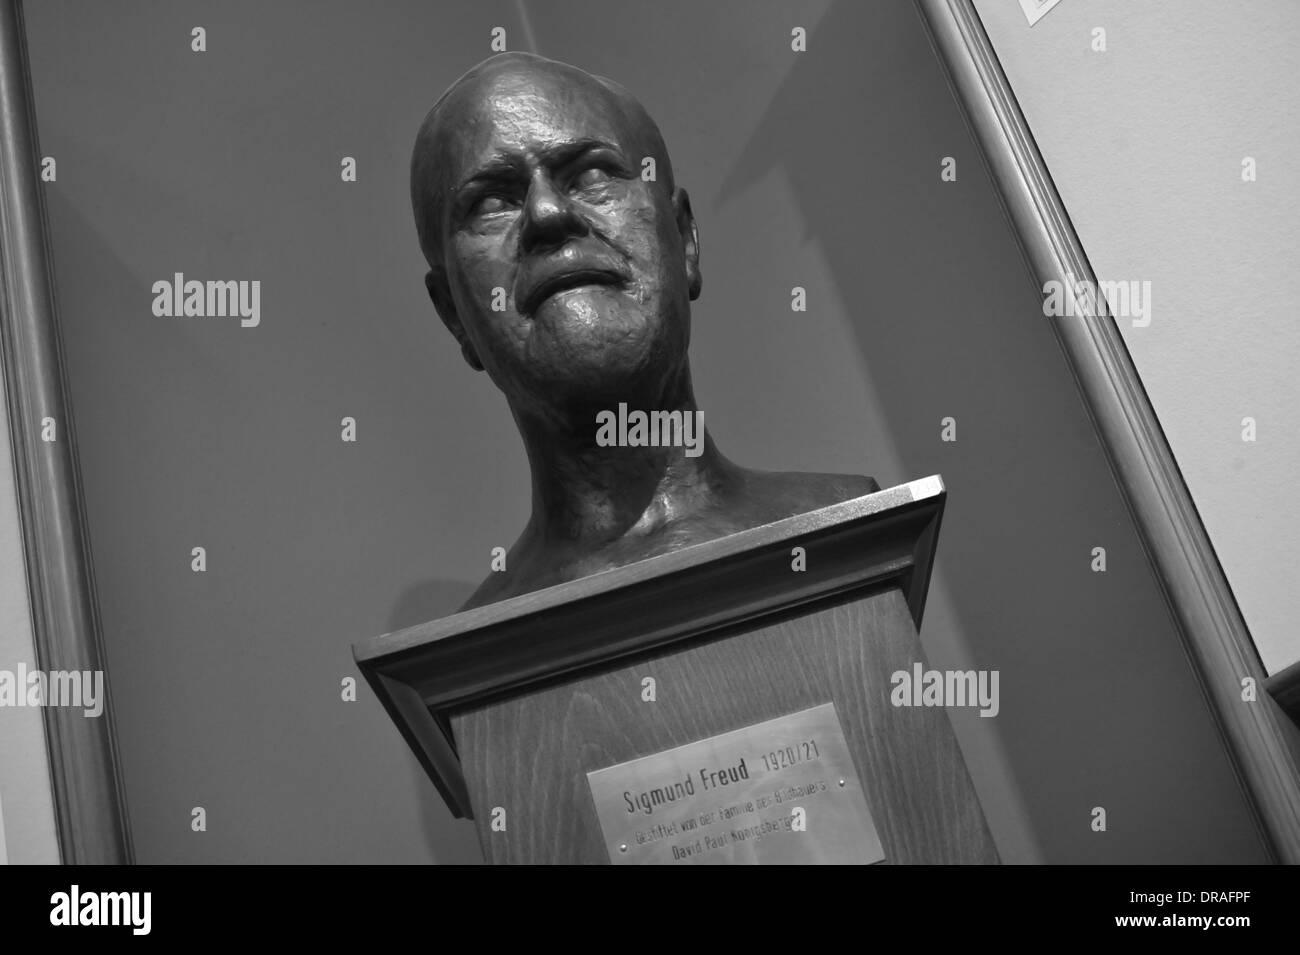 Sigmund Freud Museum, Wien, Österreich. Editorial use only. - Stock Image